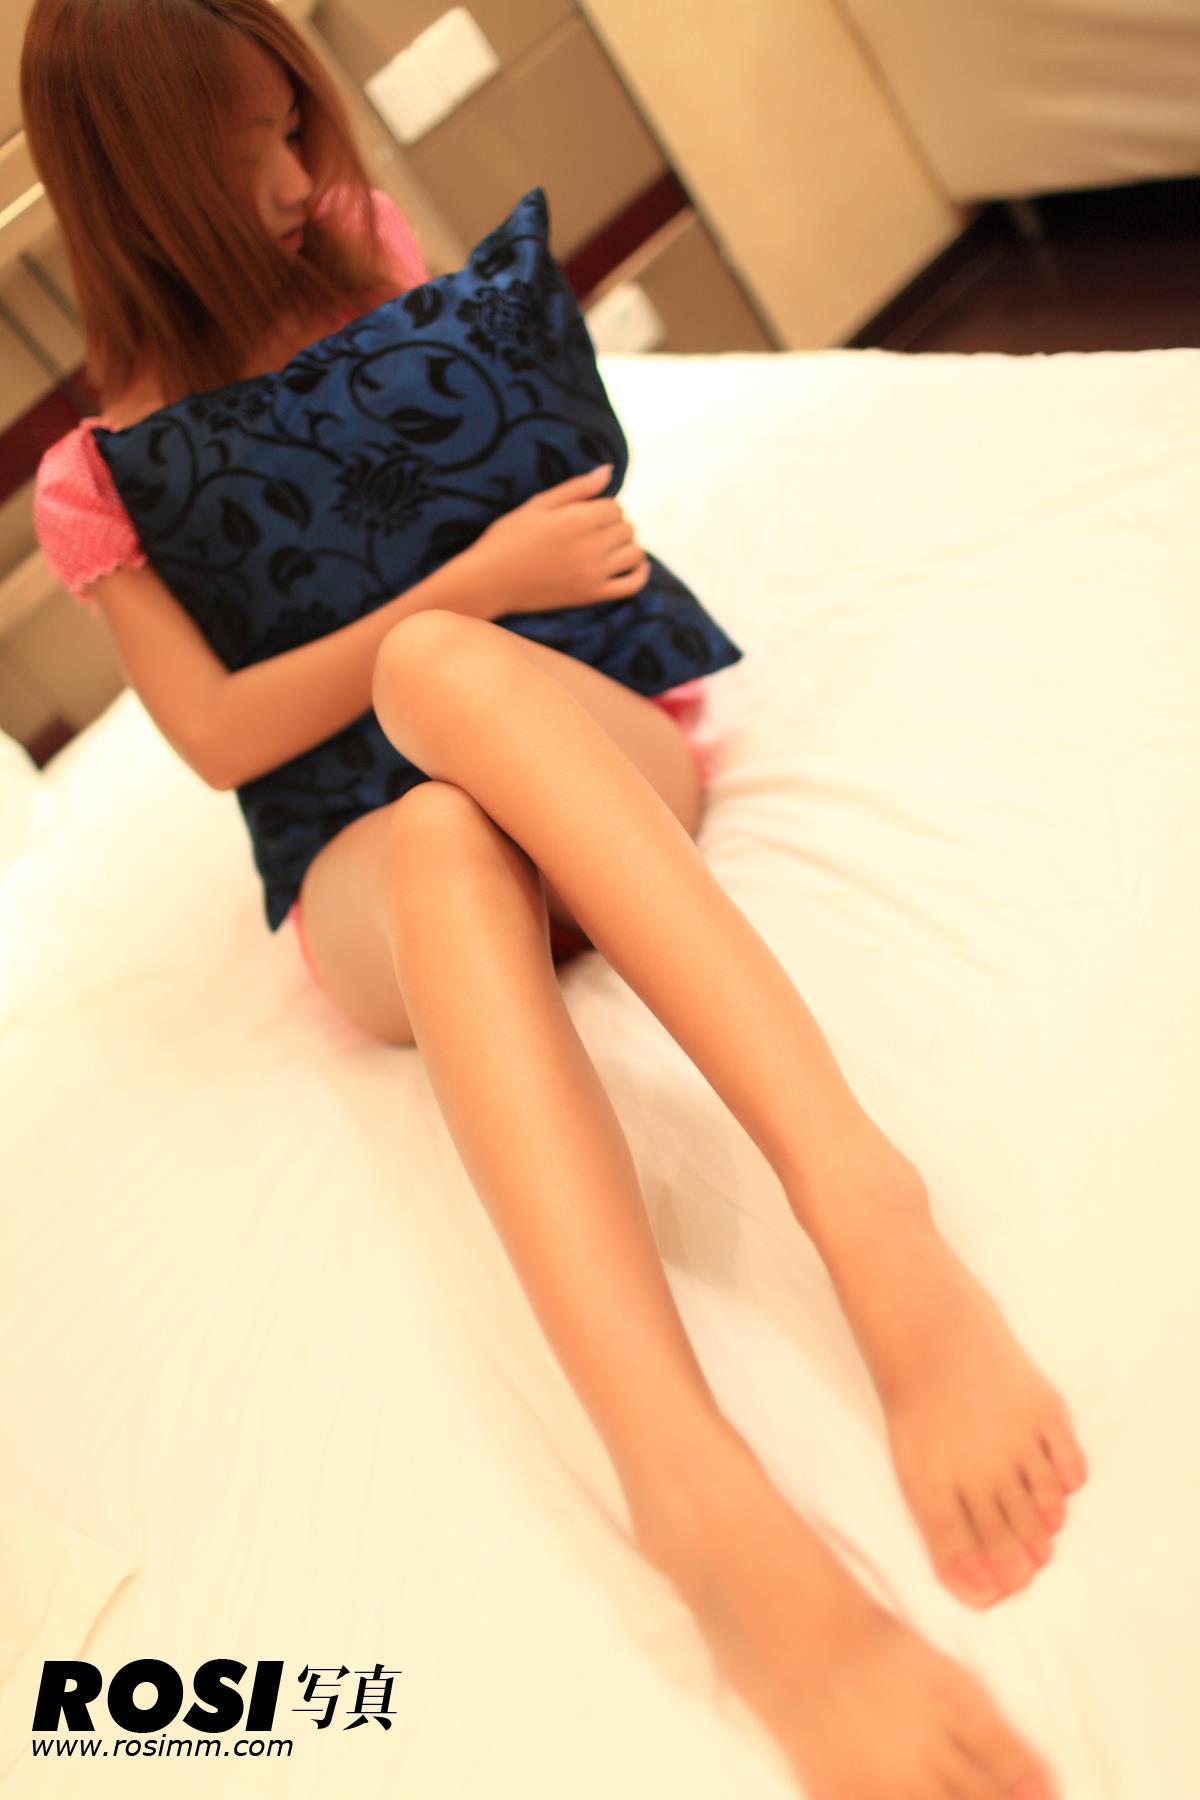 [ROSI写真]No.109 性感小美女红色连身短裙加红色蕾丝小内裤私房写真集